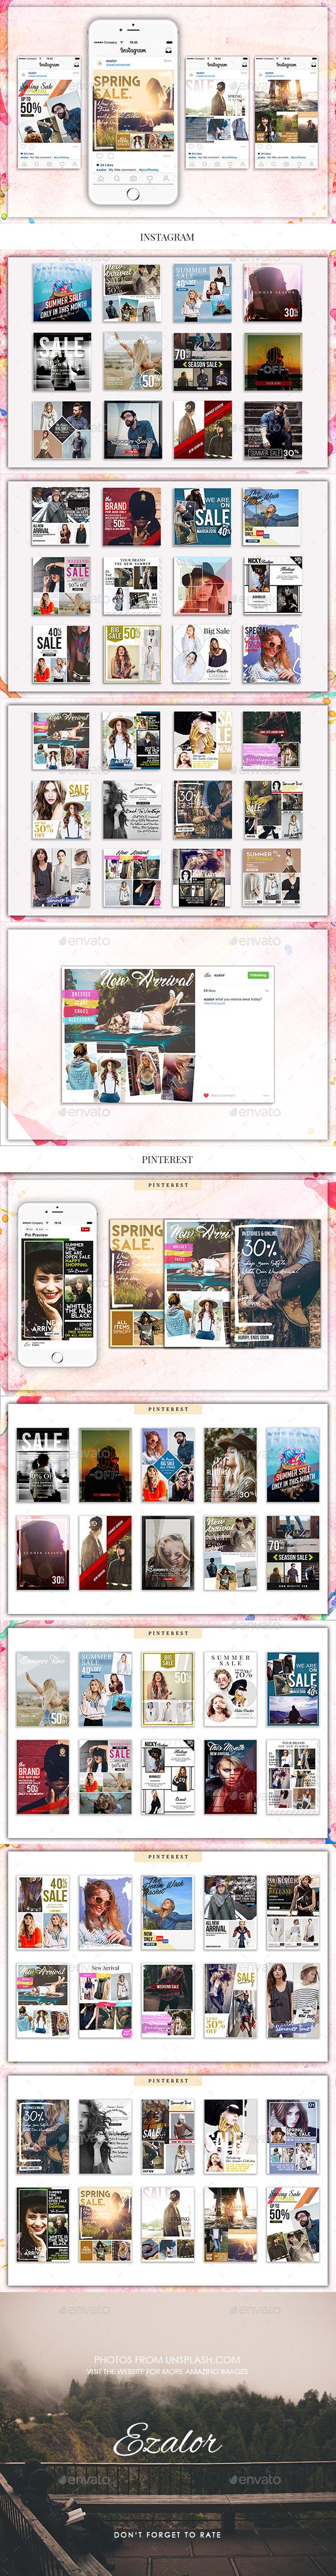 Fashion Insta and Pinterest - Social Media Web Elements